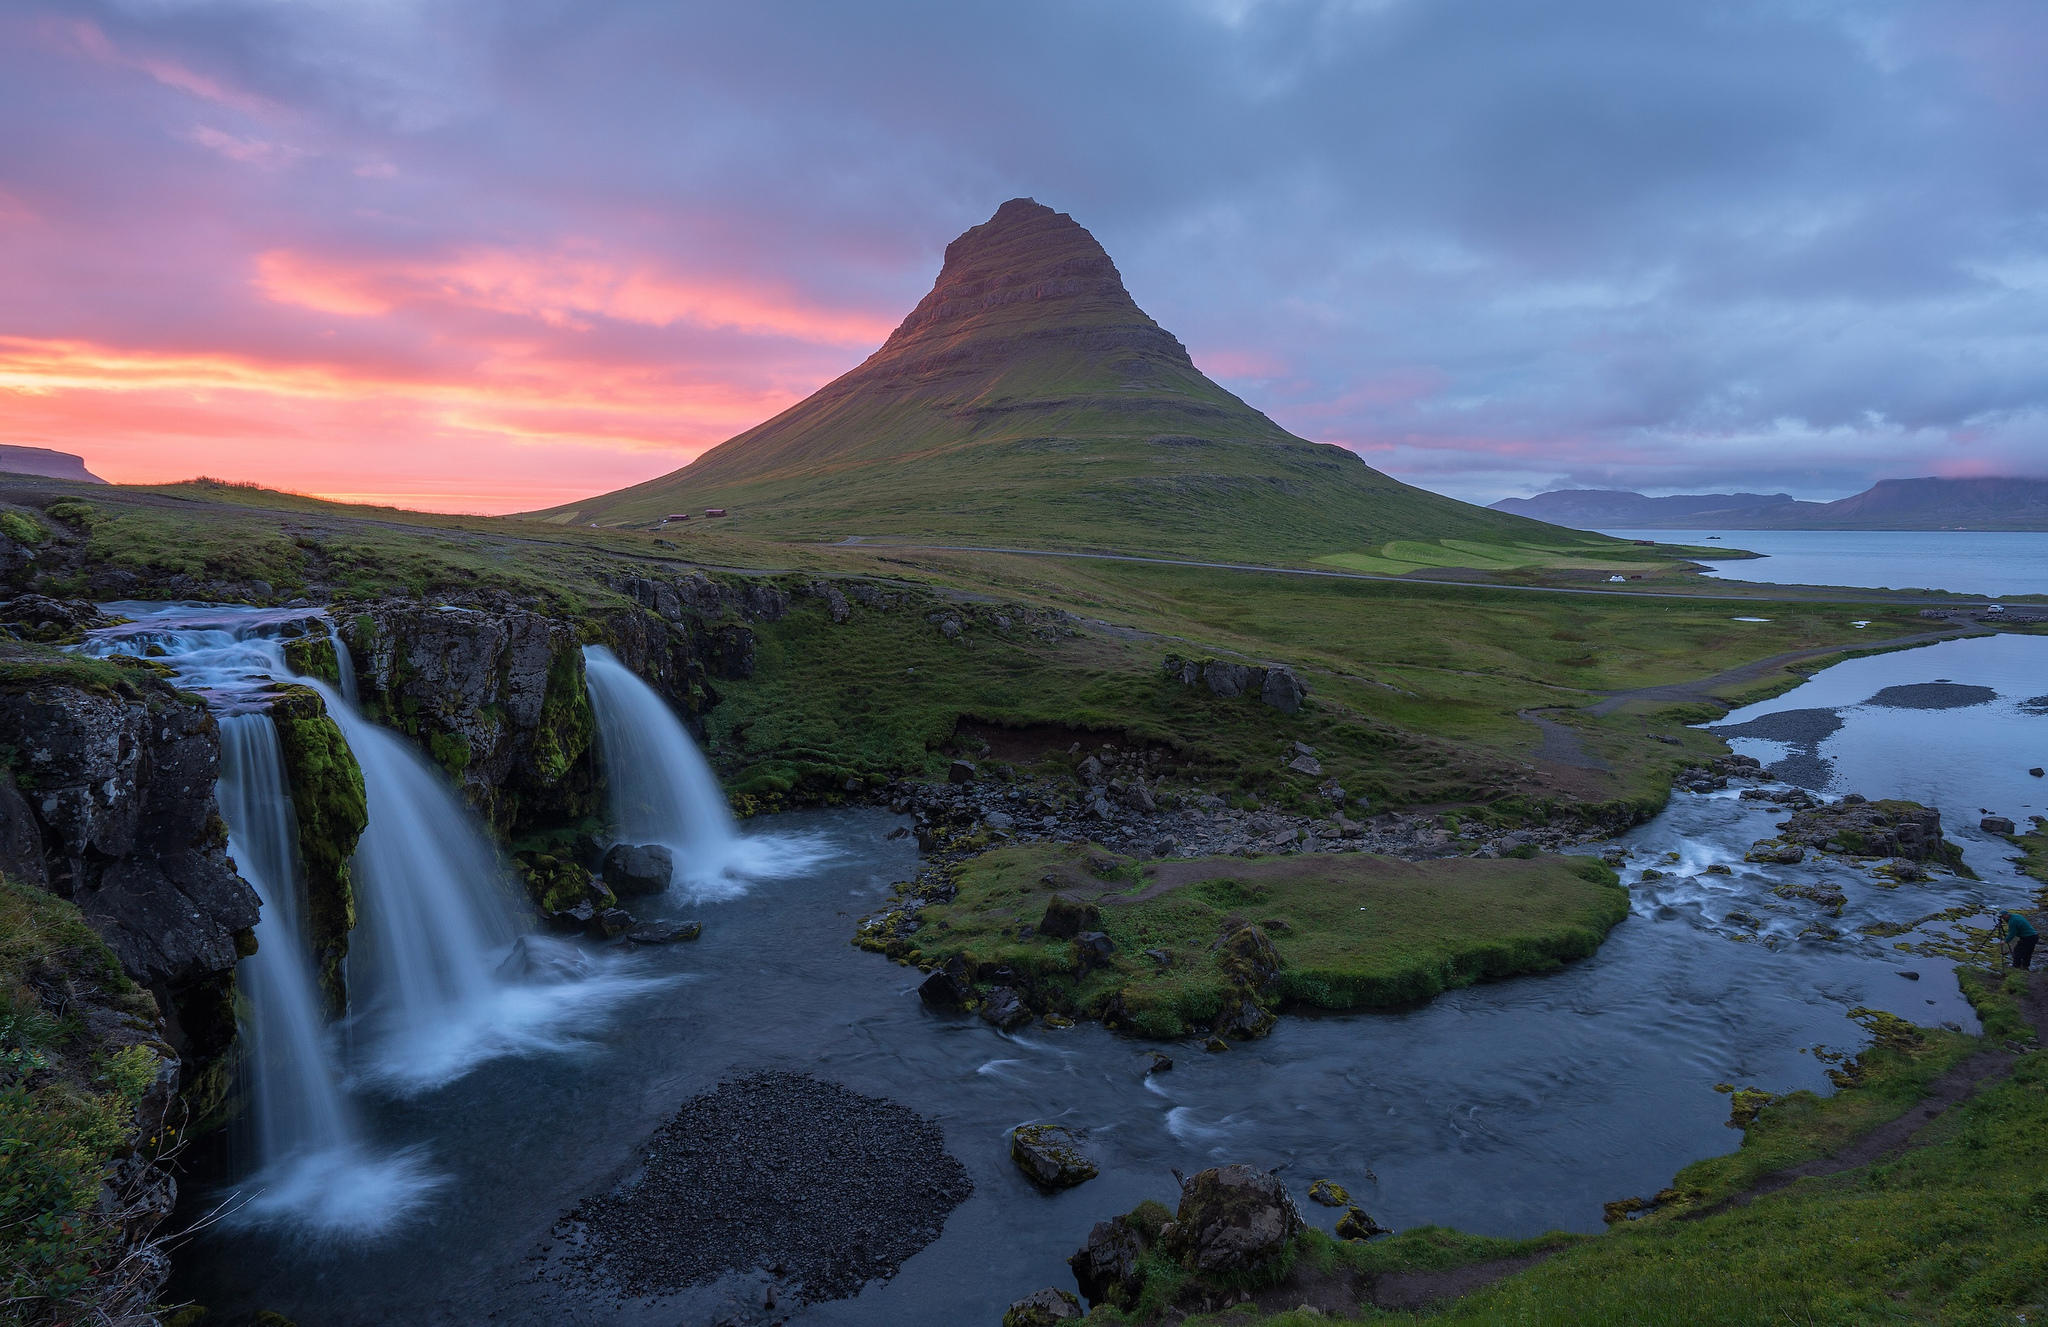 Grundarfjorour, Киркьюфетль, Исландия